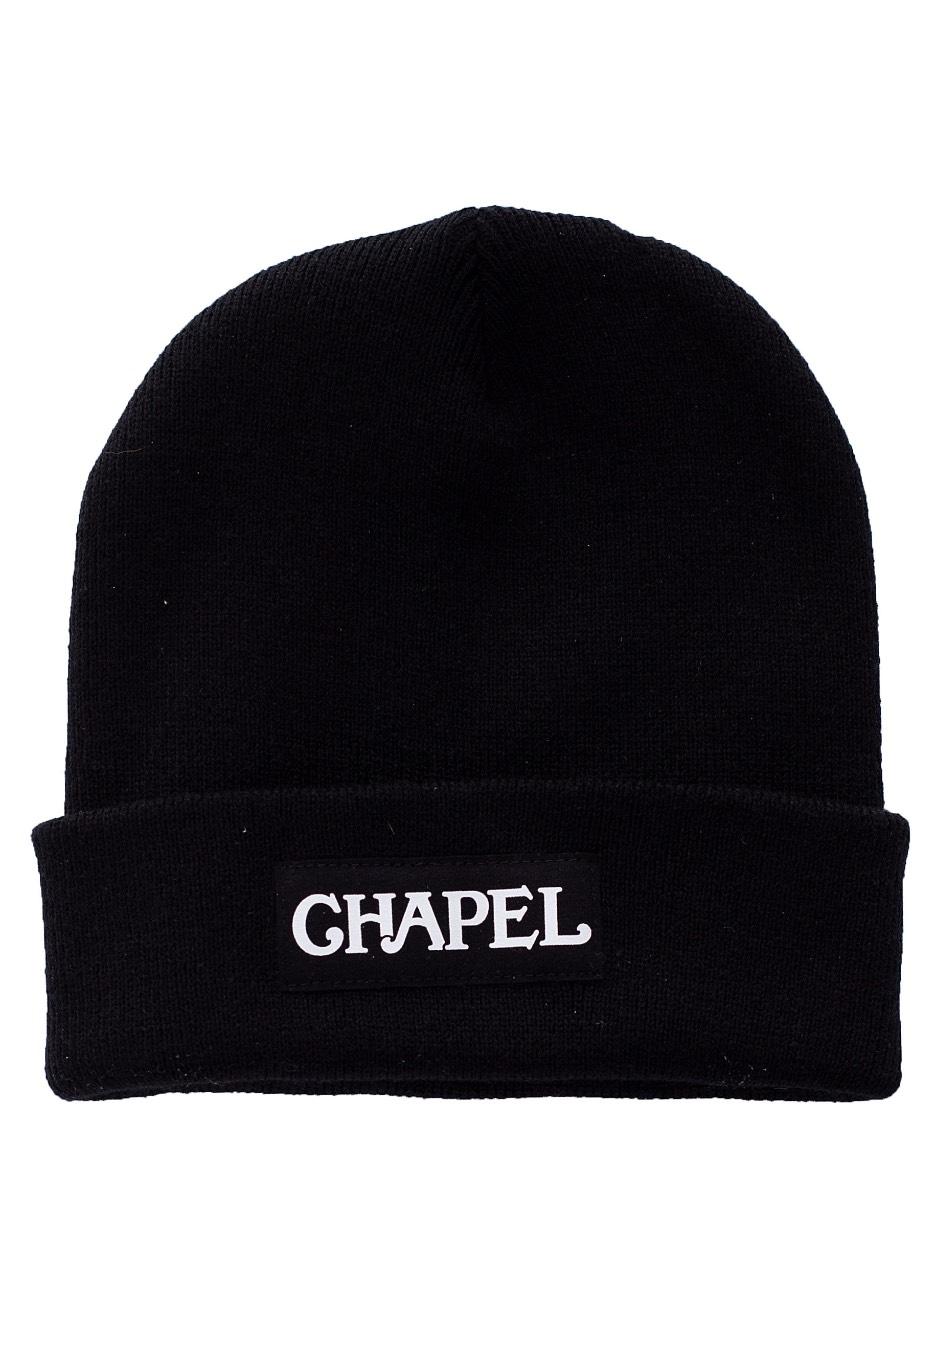 Chapel - Logo - Beanies